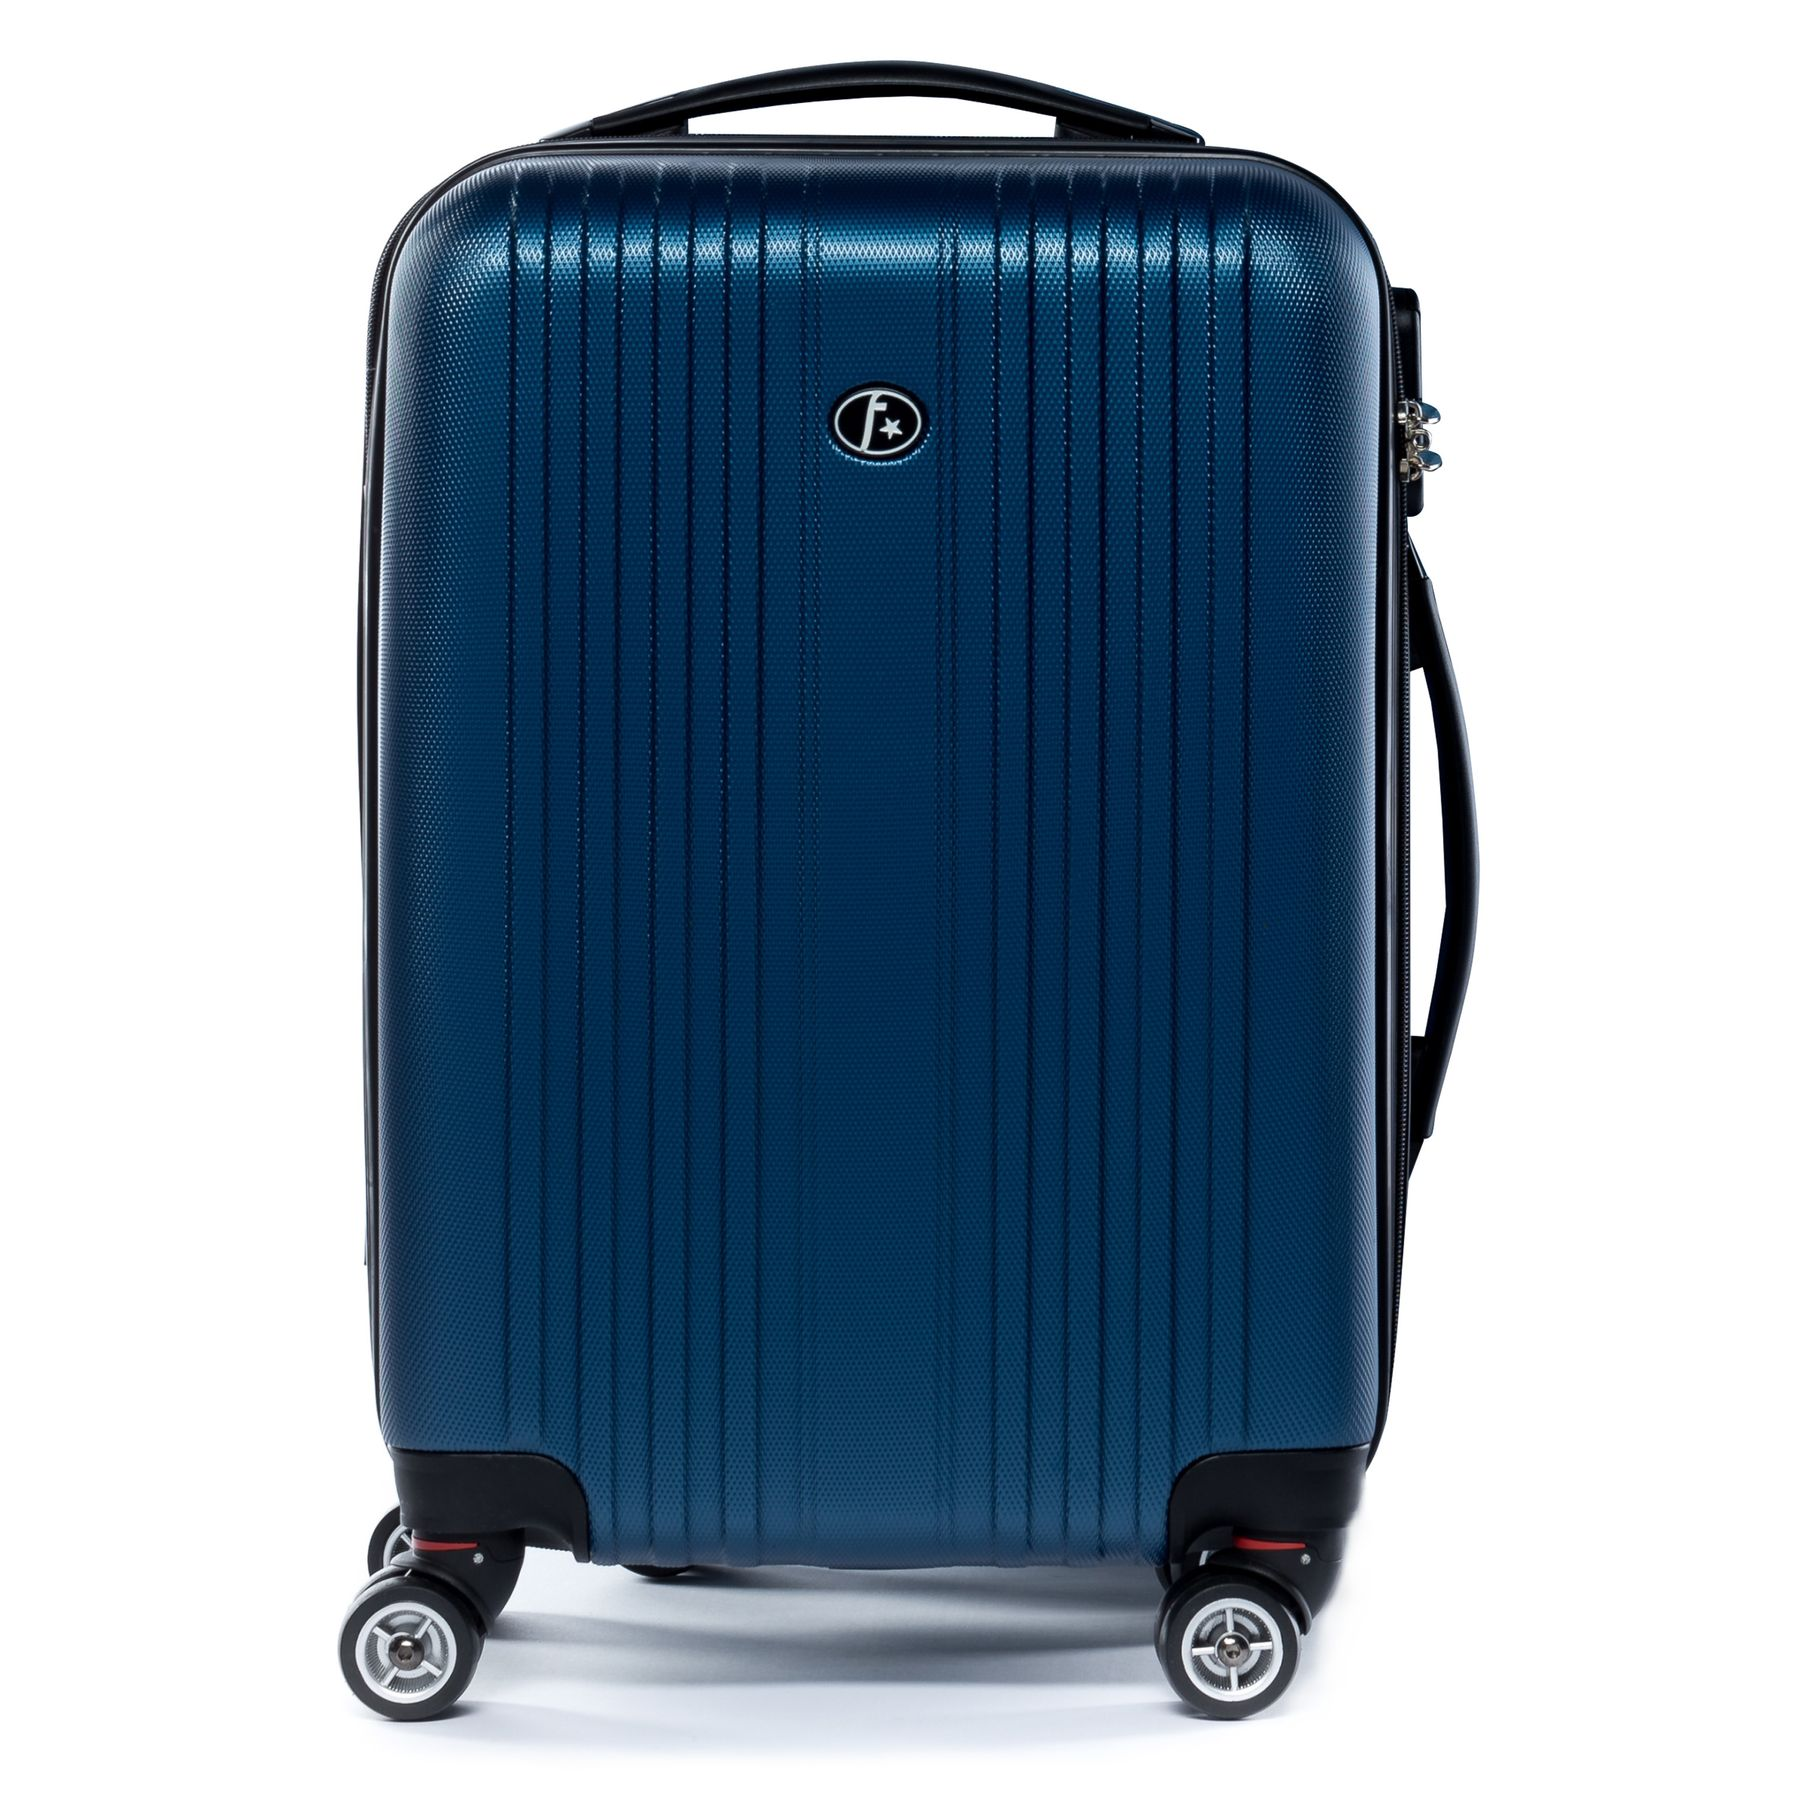 ferg handgep ck koffer toulouse carry on bordgep ck. Black Bedroom Furniture Sets. Home Design Ideas